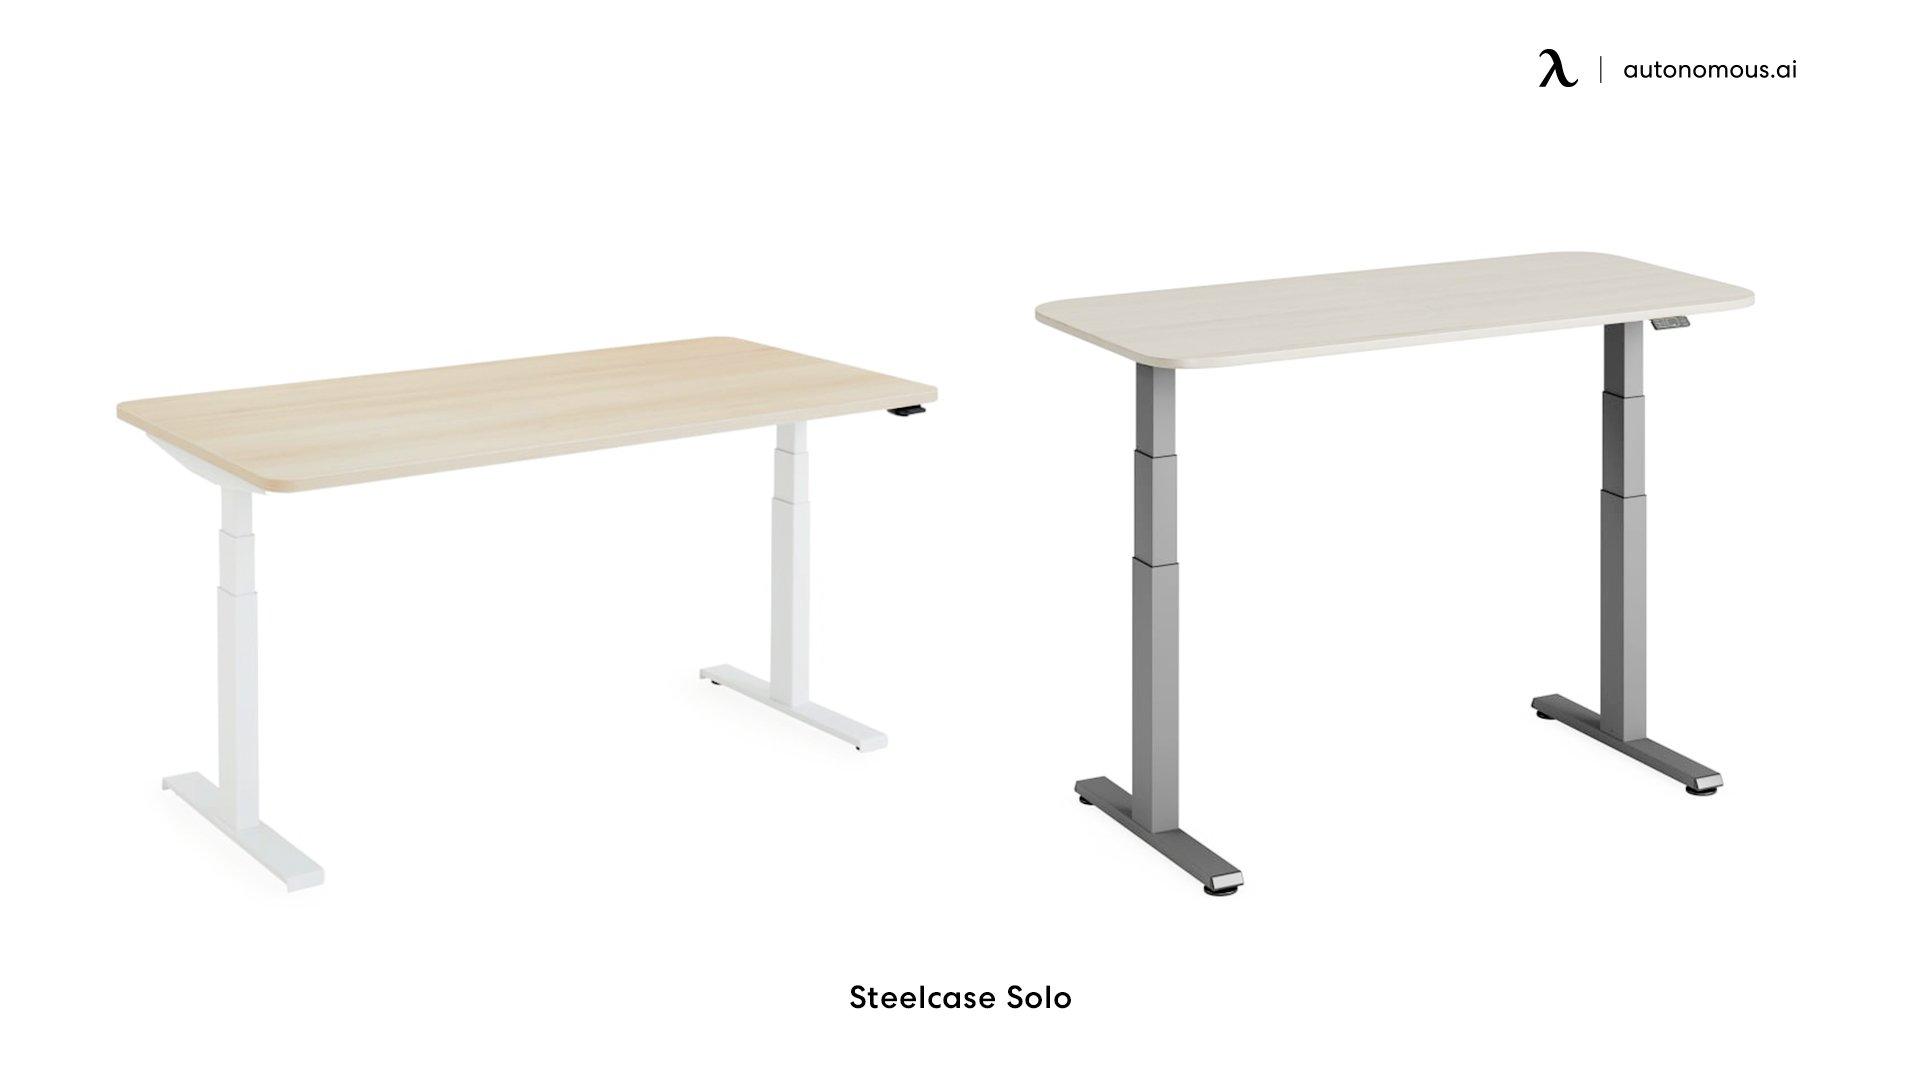 Steelcase Solo